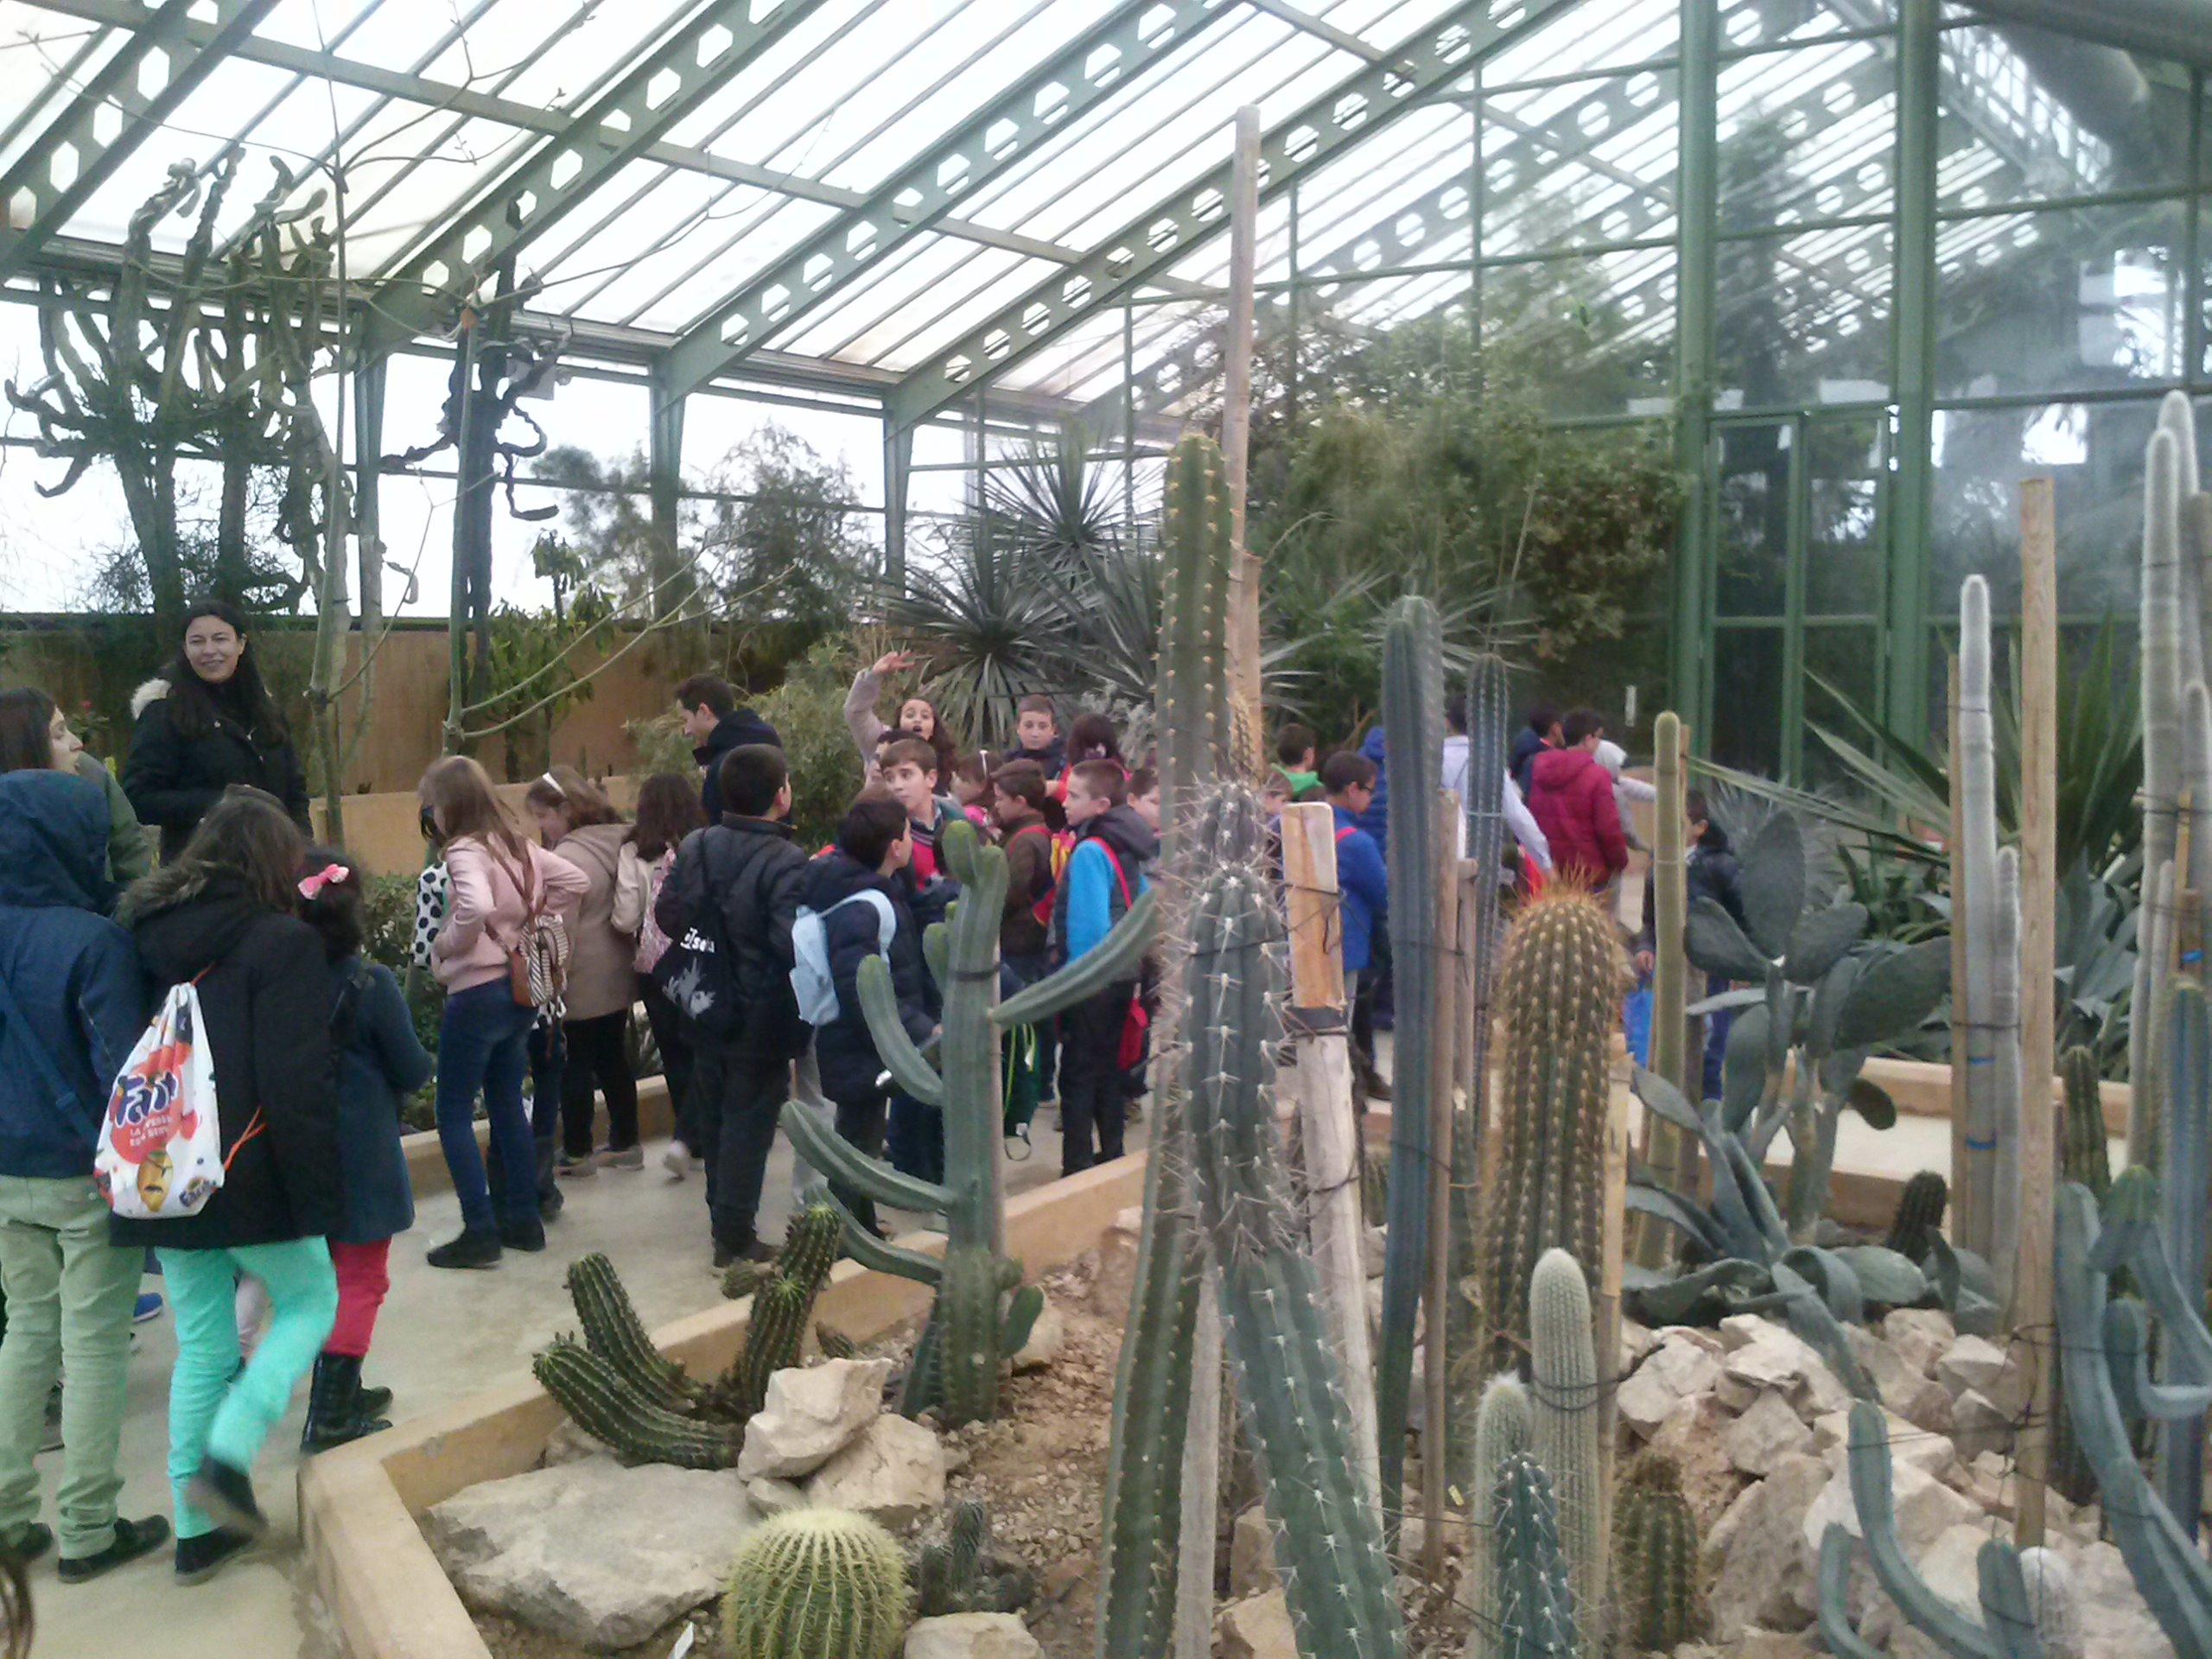 Visita al jard n bot nico de clm albacete ceip pablo for Ceip jardin botanico